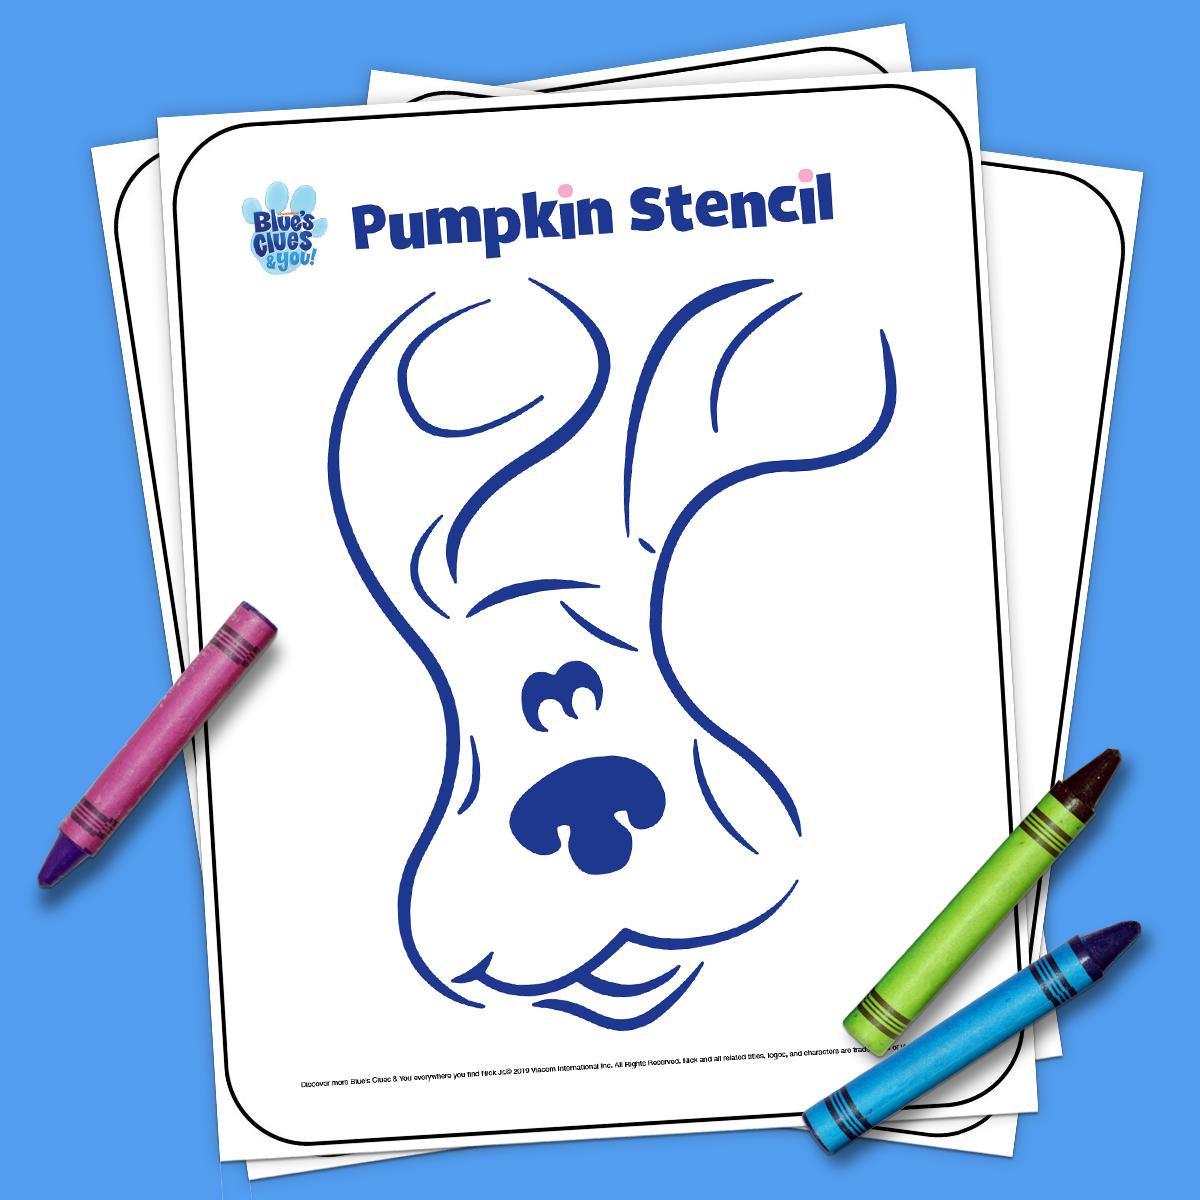 Blue pumpkin stencil